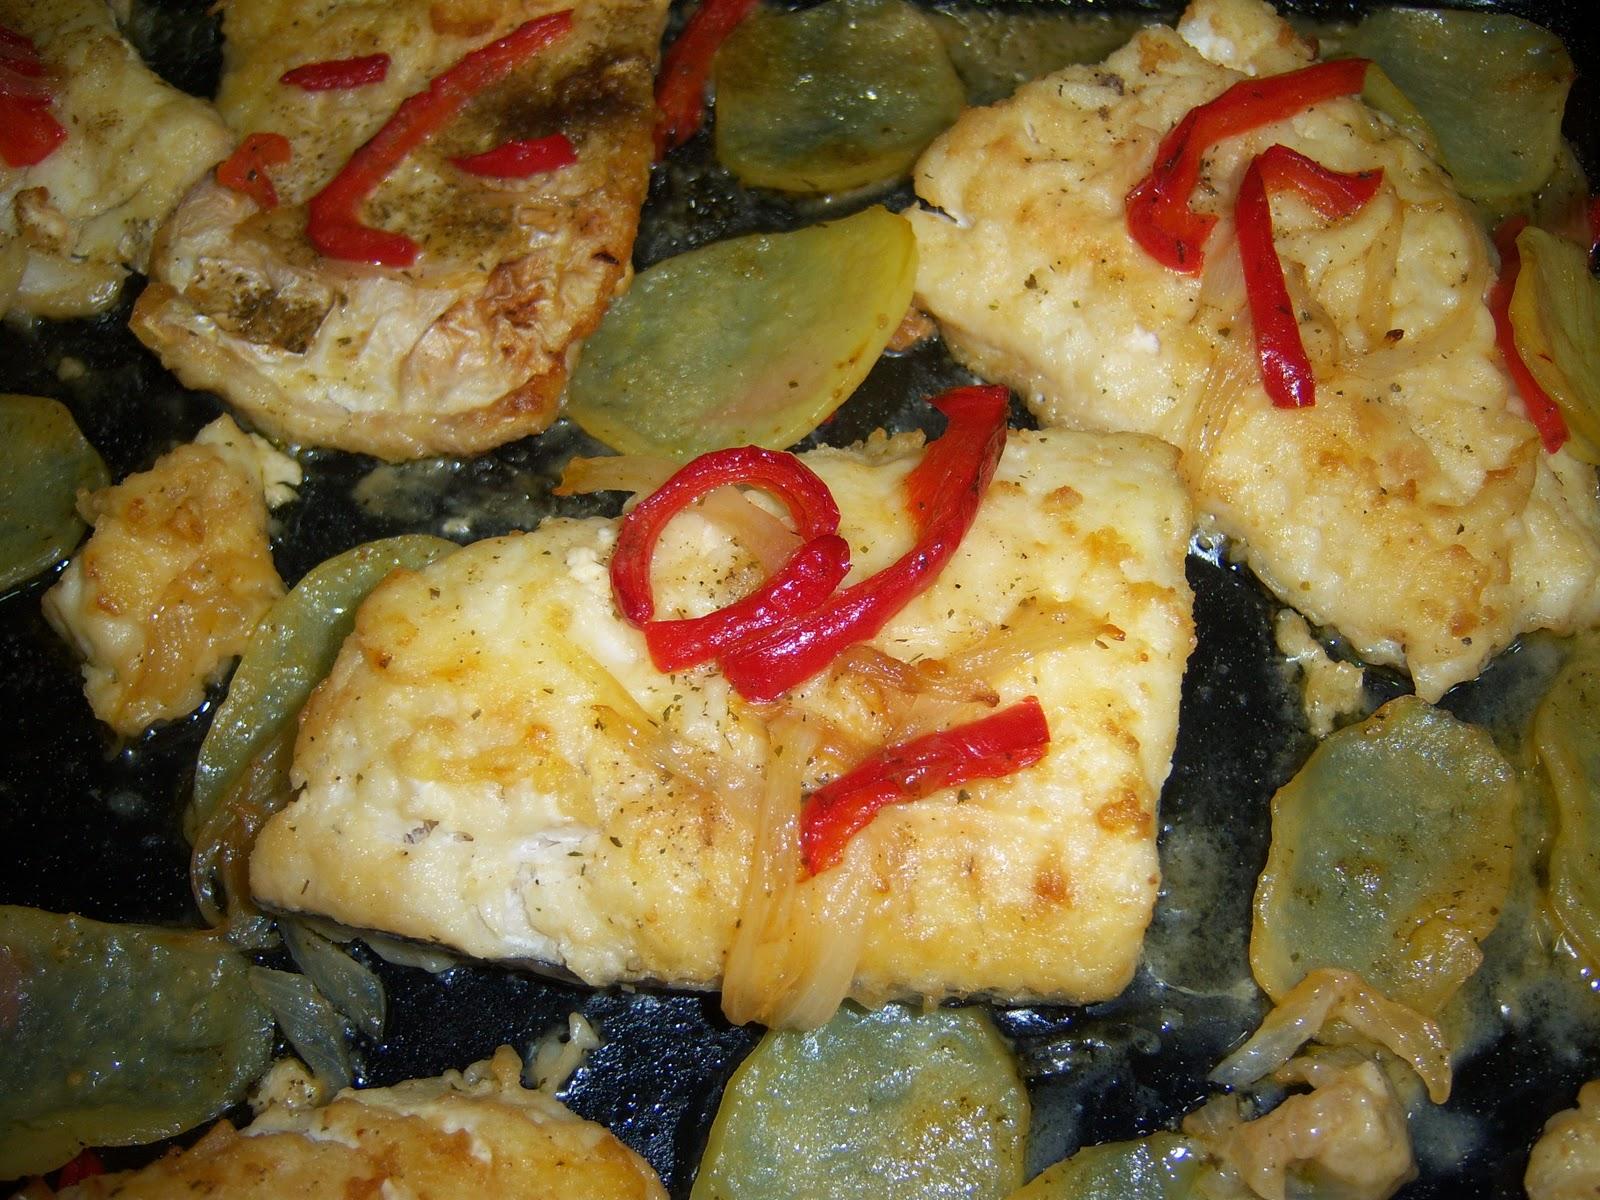 Merluza al horno con patatas - Merluza rellena de marisco al horno ...